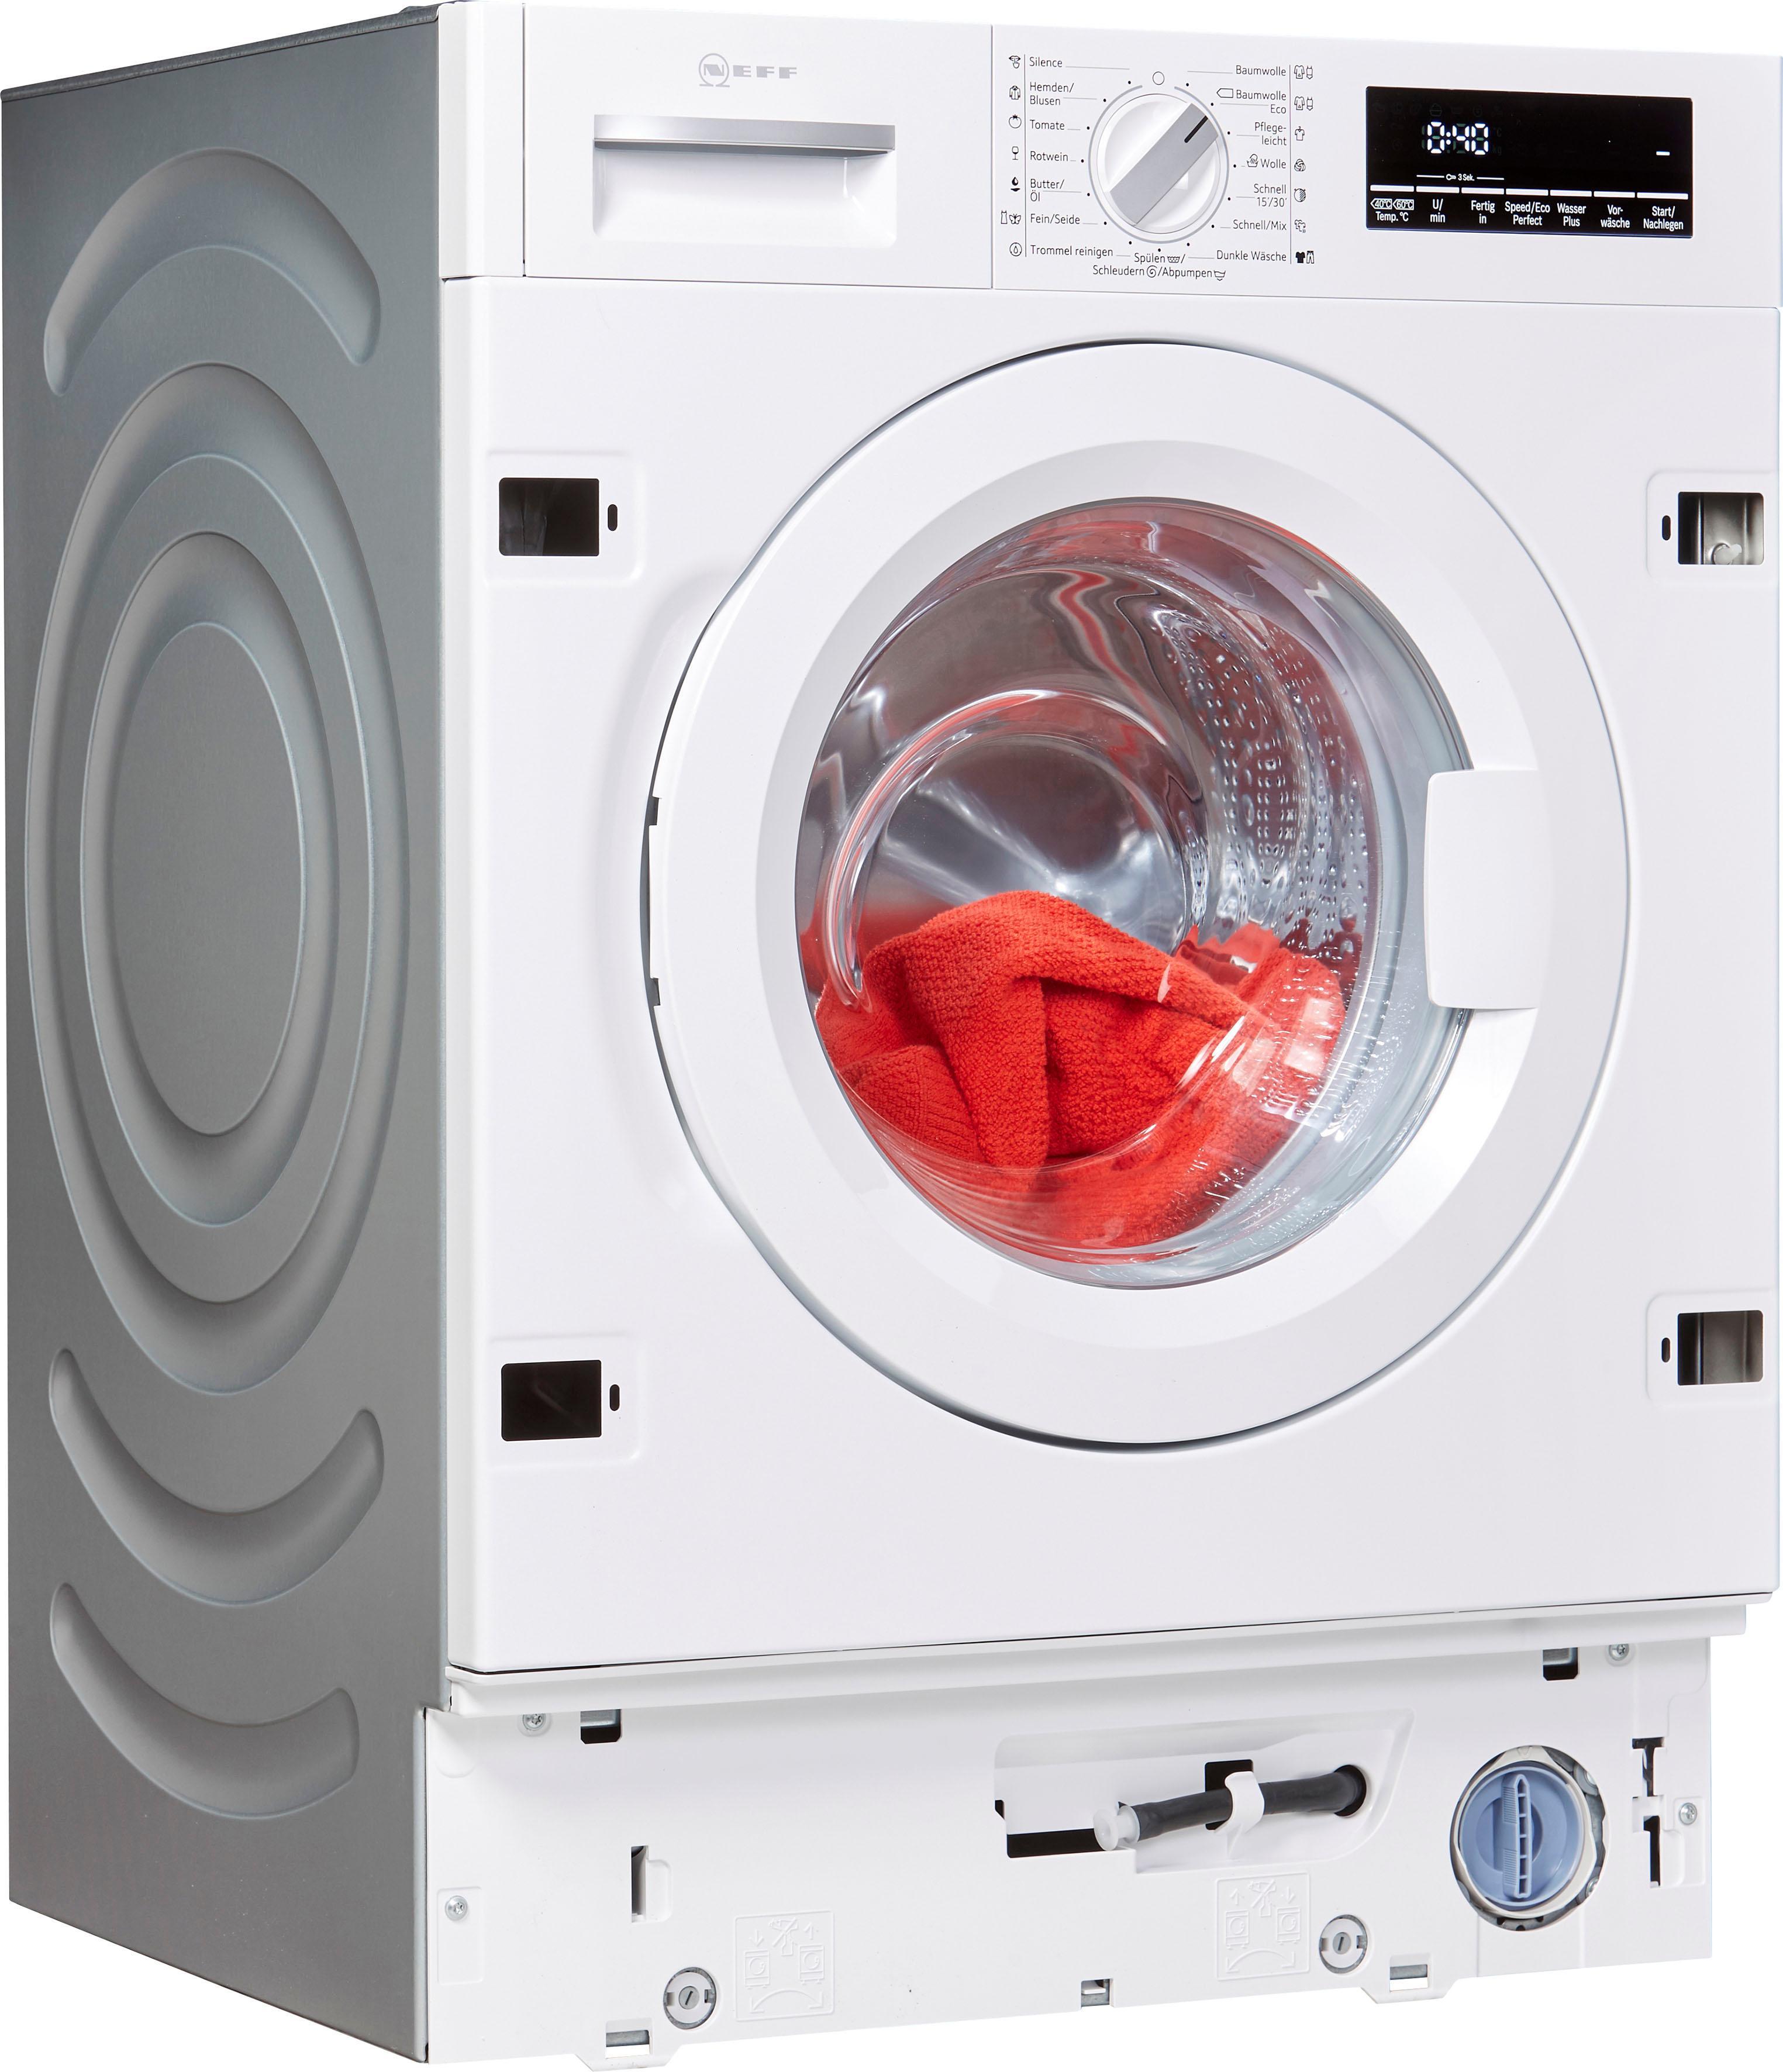 NEFF Einbauwaschmaschine WV644 W6440X0   Bad > Waschmaschinen und Trockner > Einbauwaschmaschinen   NEFF